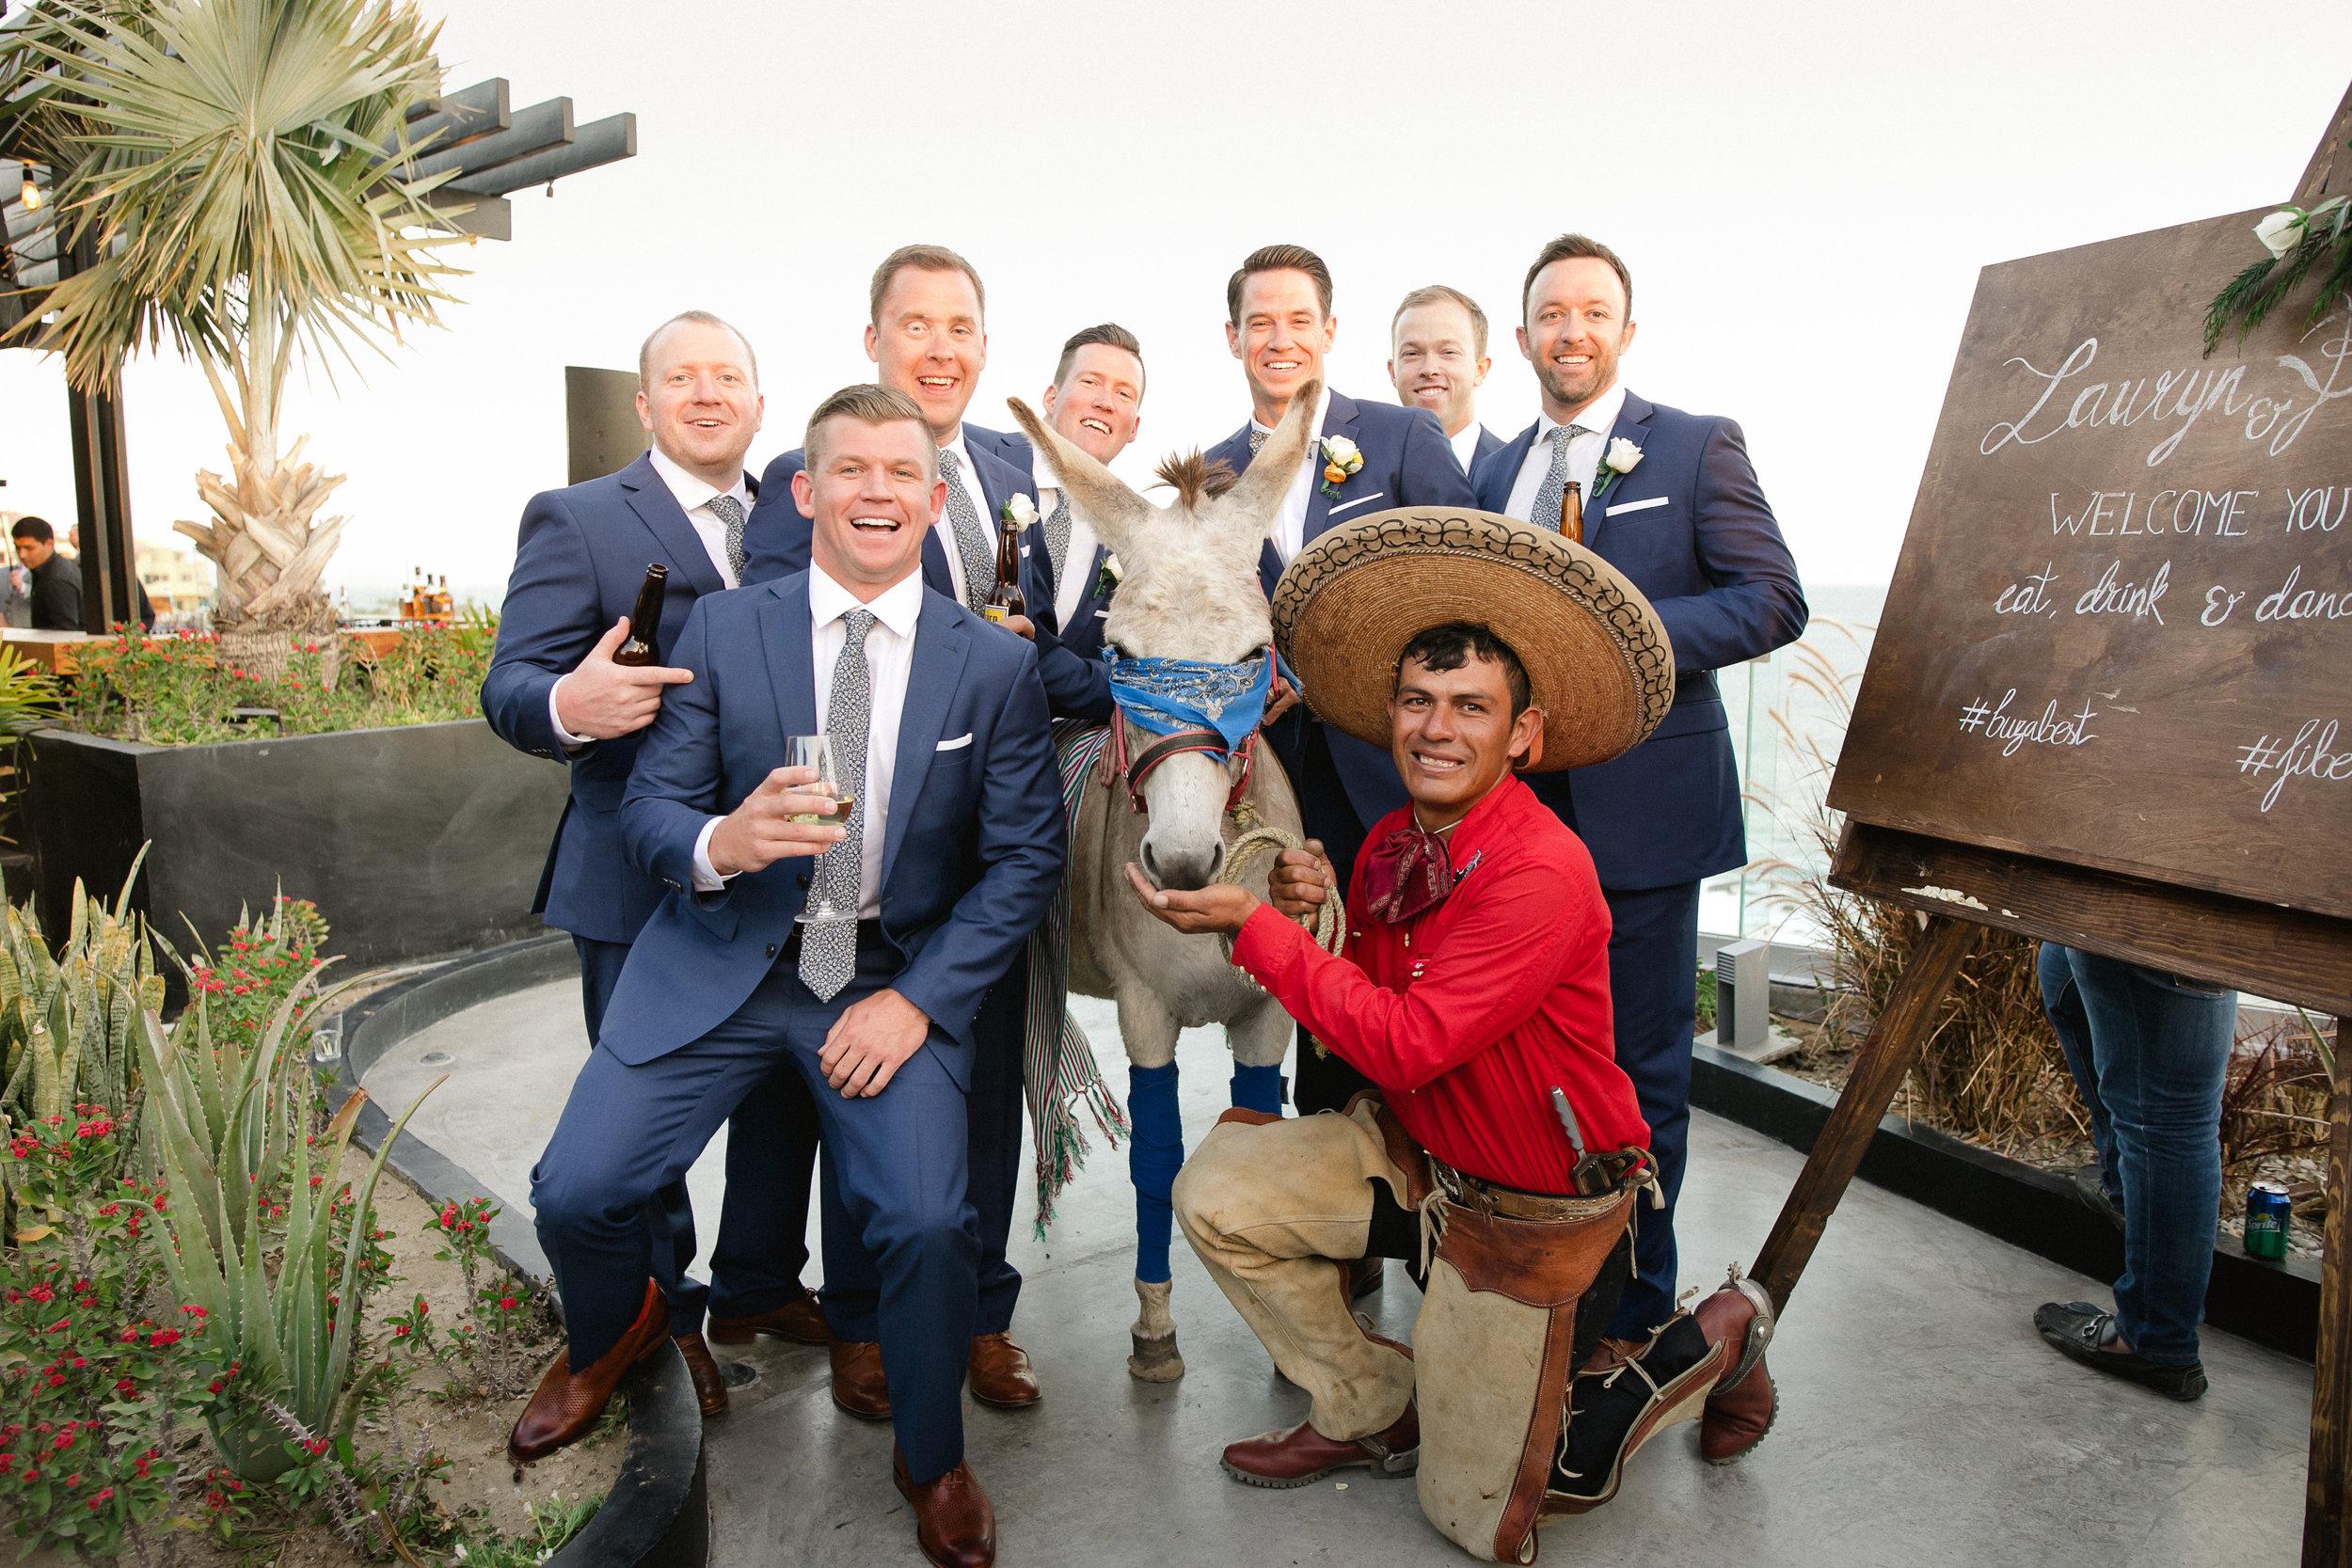 Click by Chris+Lynn | Wedding by Karla Casillas and Co. | Donkey Lolo